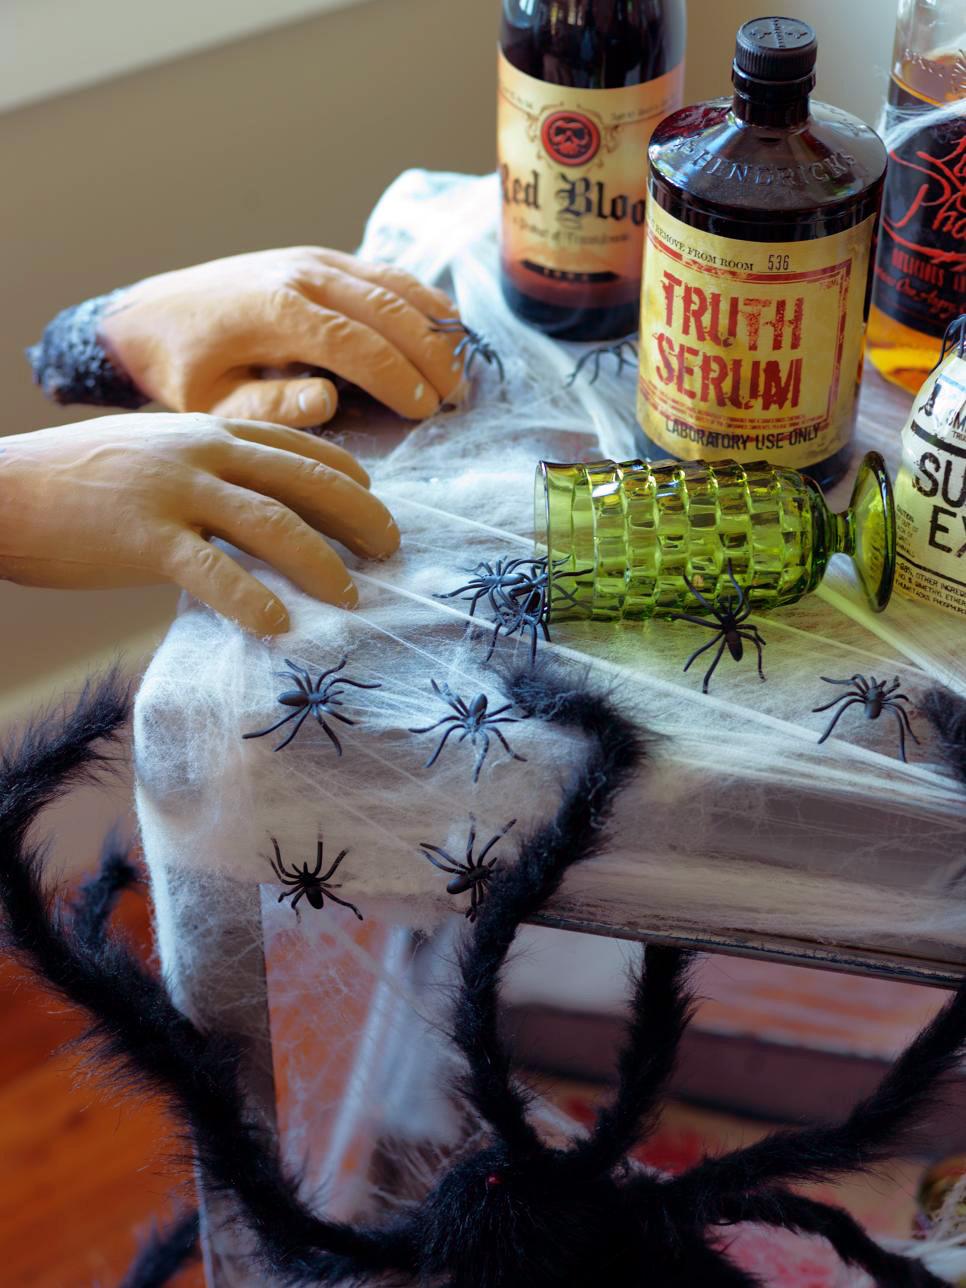 CI Susan Teare Halloween Bar s3x4.jpg.rend .hgtvcom.966 15 Easy Halloween Decoration Ideas For Your Home